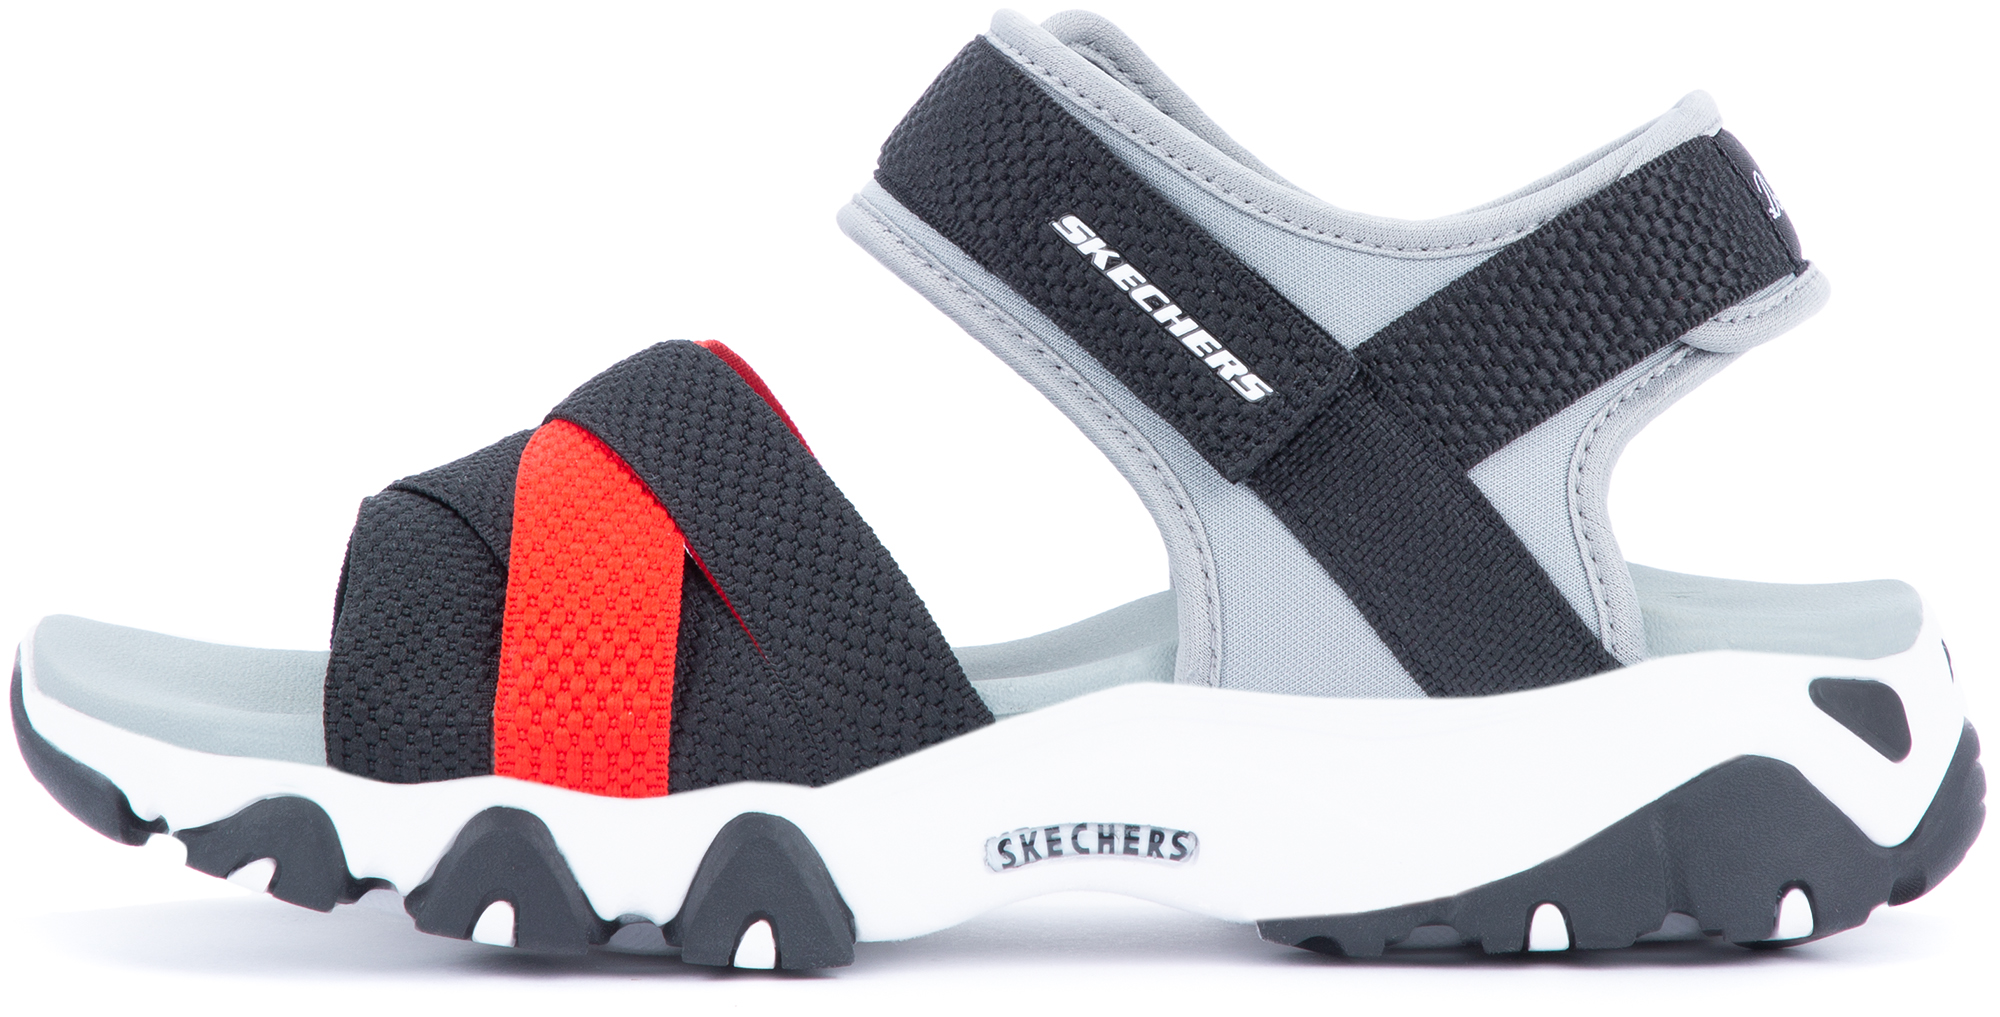 Skechers Сандалии женские Skechers D'Lites 2.0 Mega Summer, размер 42 skechers сандалии женские skechers on the go 600 размер 42